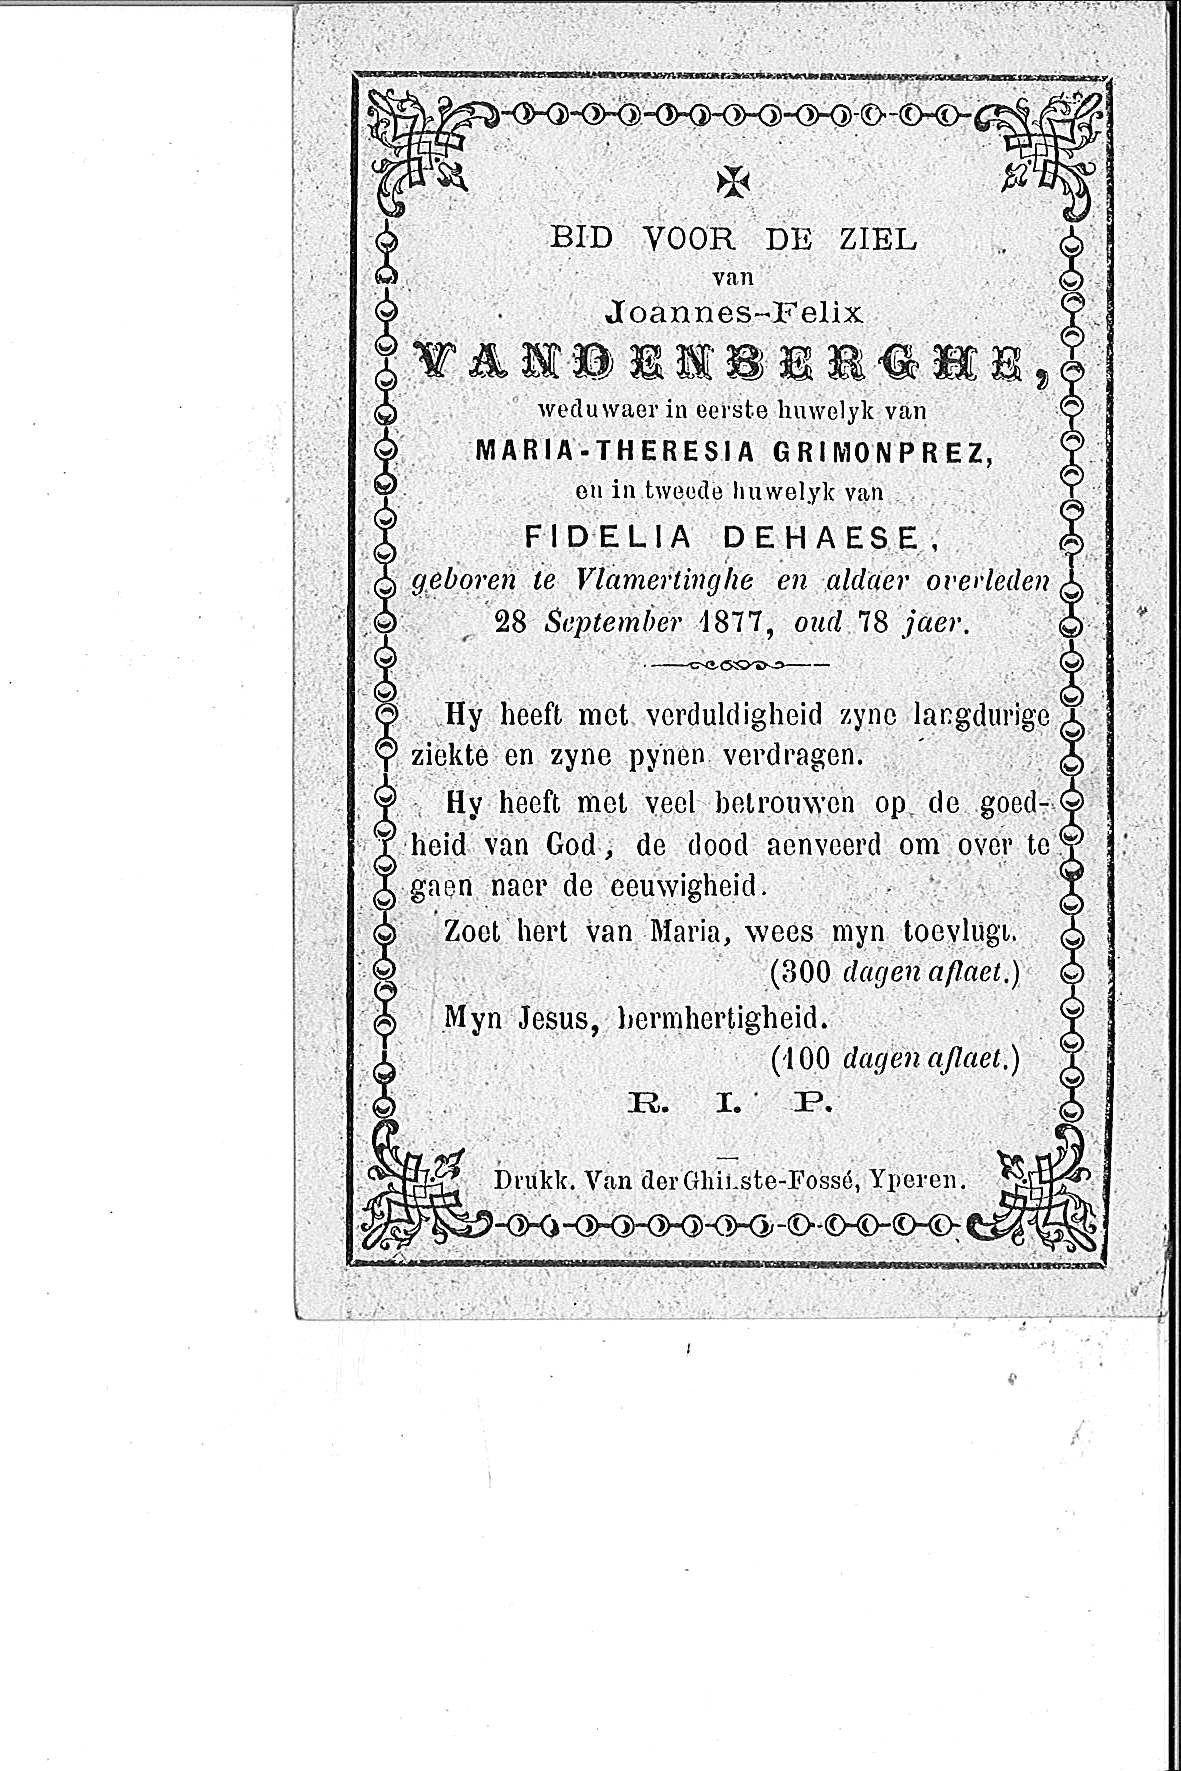 Joannes_Felix(1877)20150803143905_00016.jpg